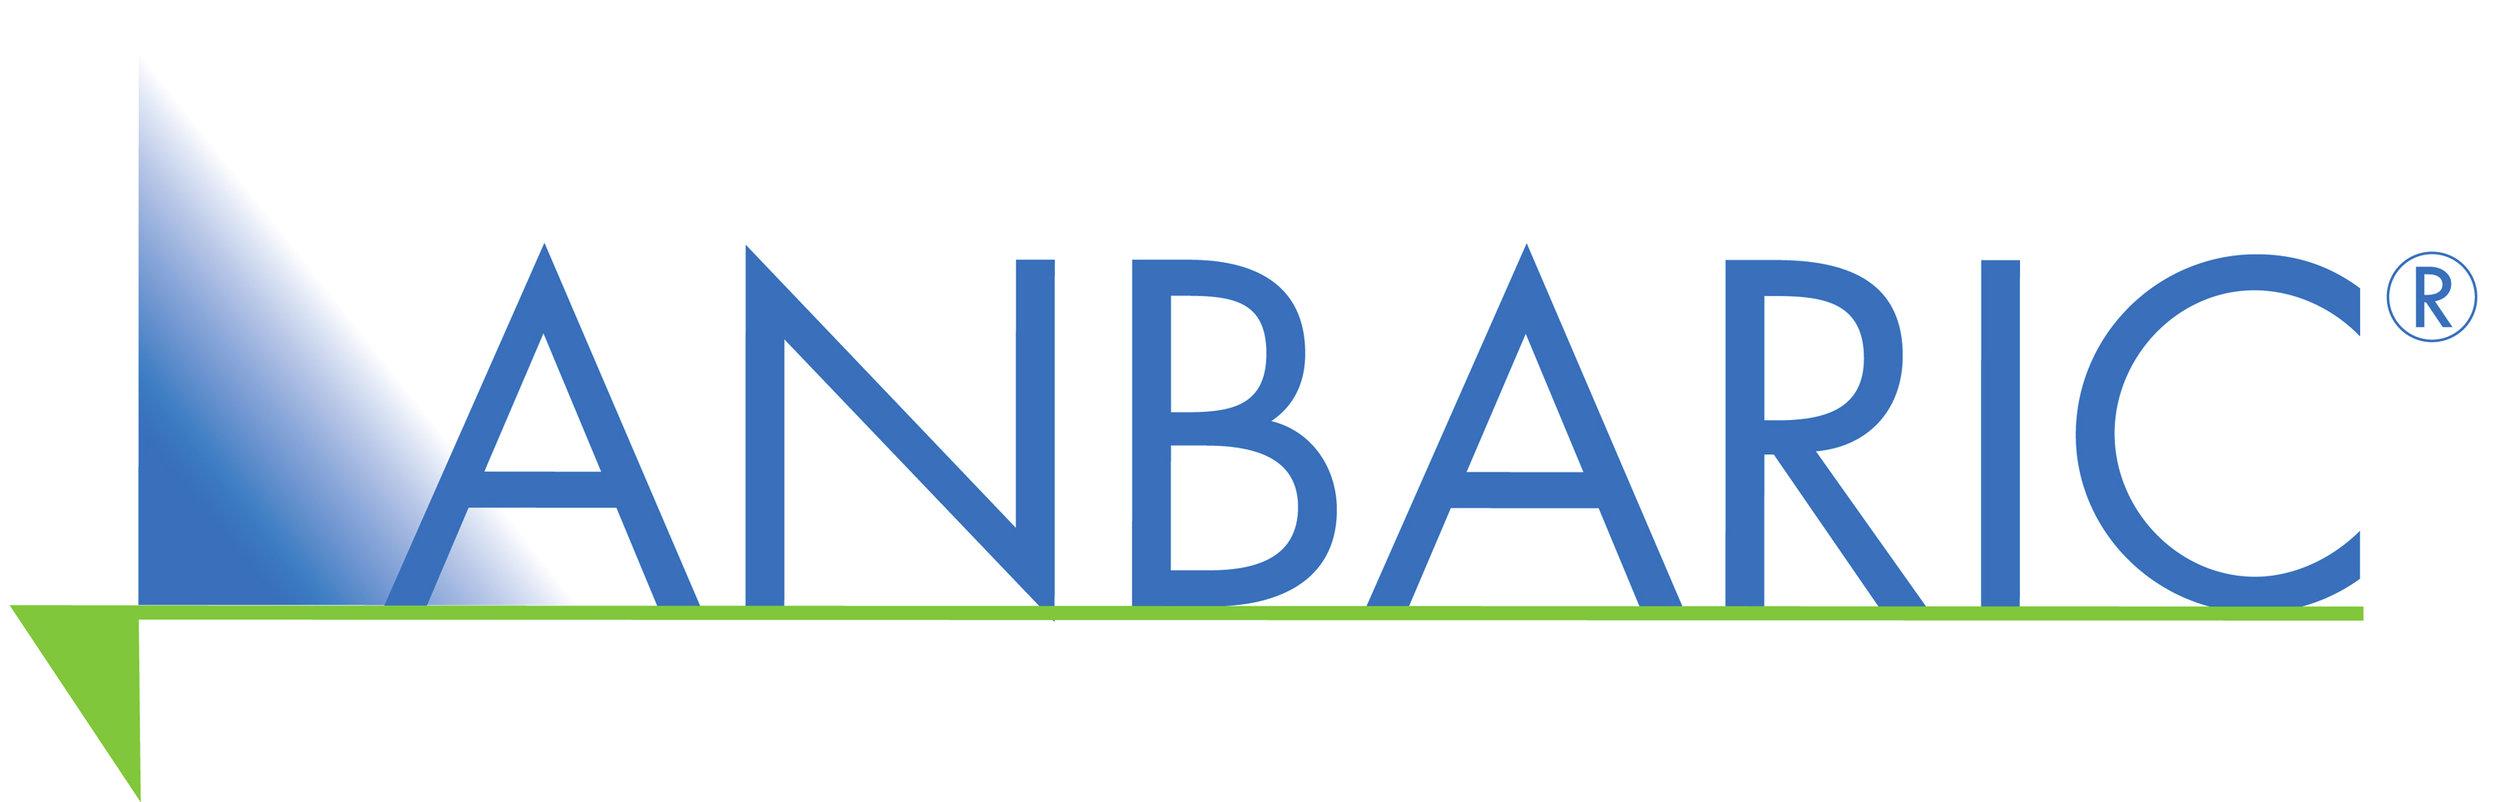 Anbaric Logo.jpg